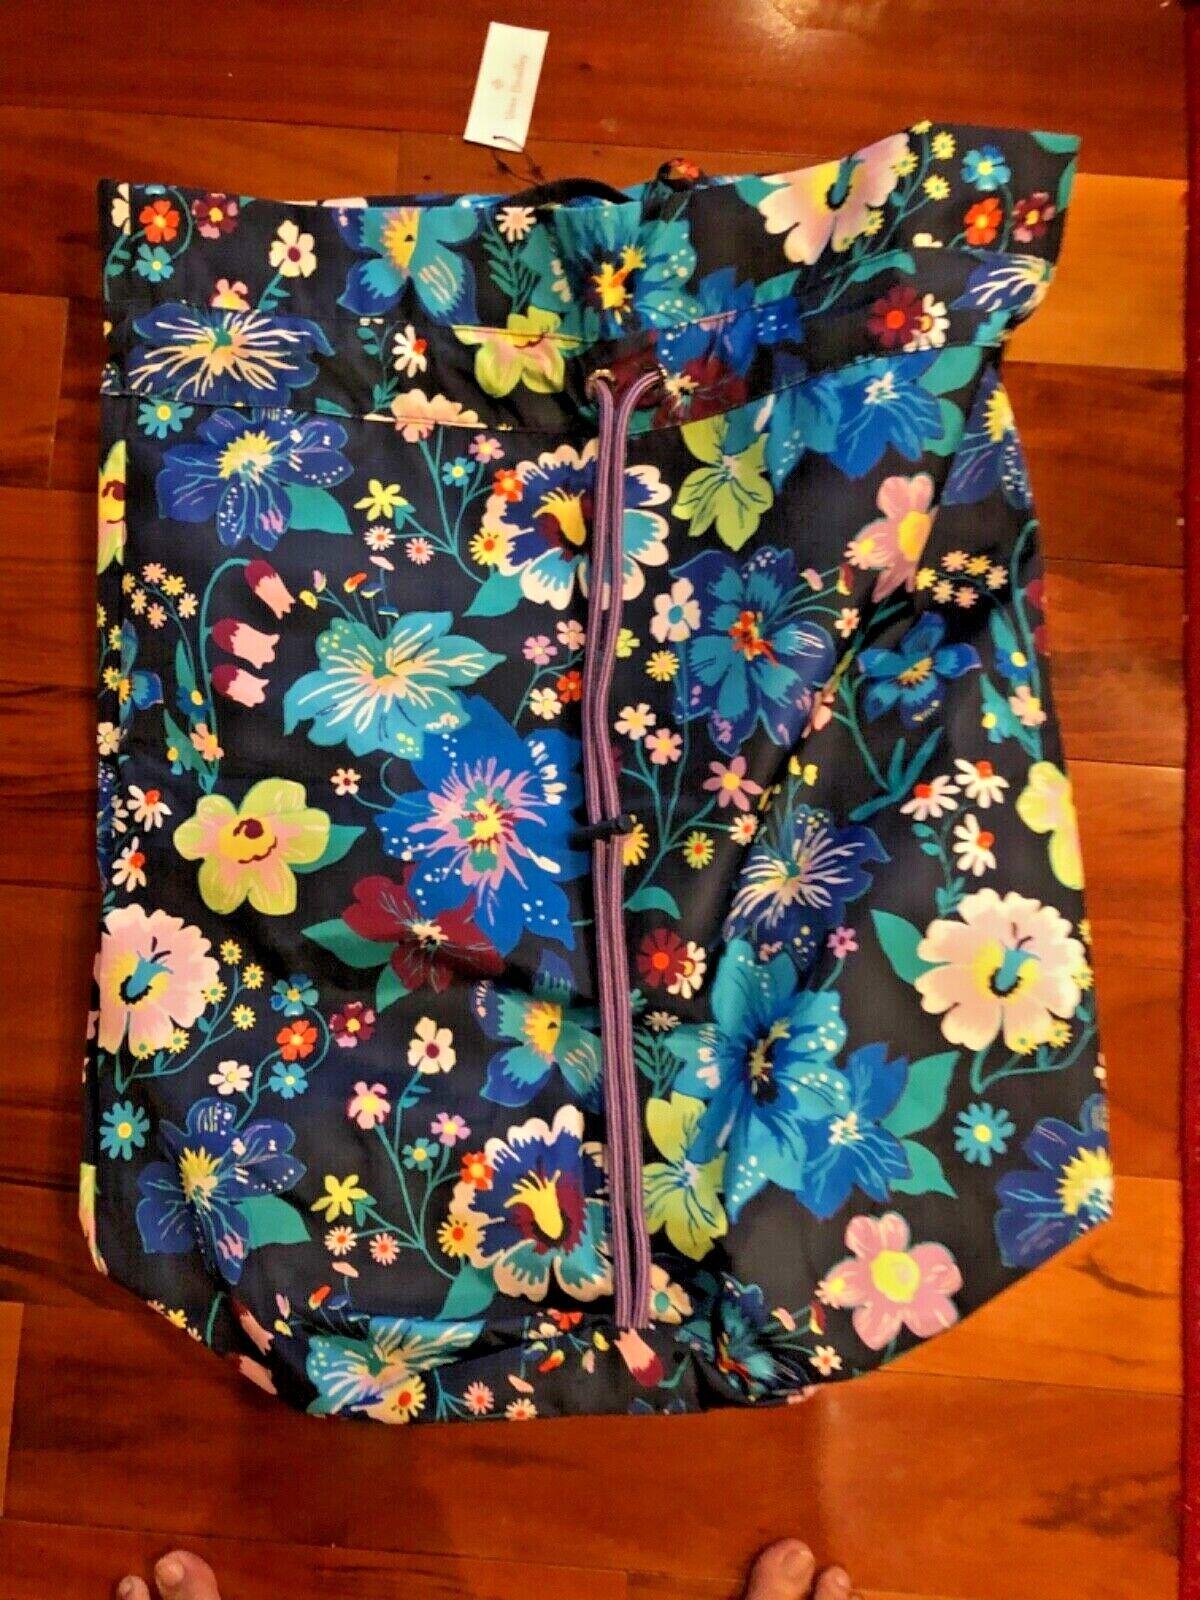 NWT NEW Vera Bradley Laundry Bag Firefly Garden Cinch Sack R